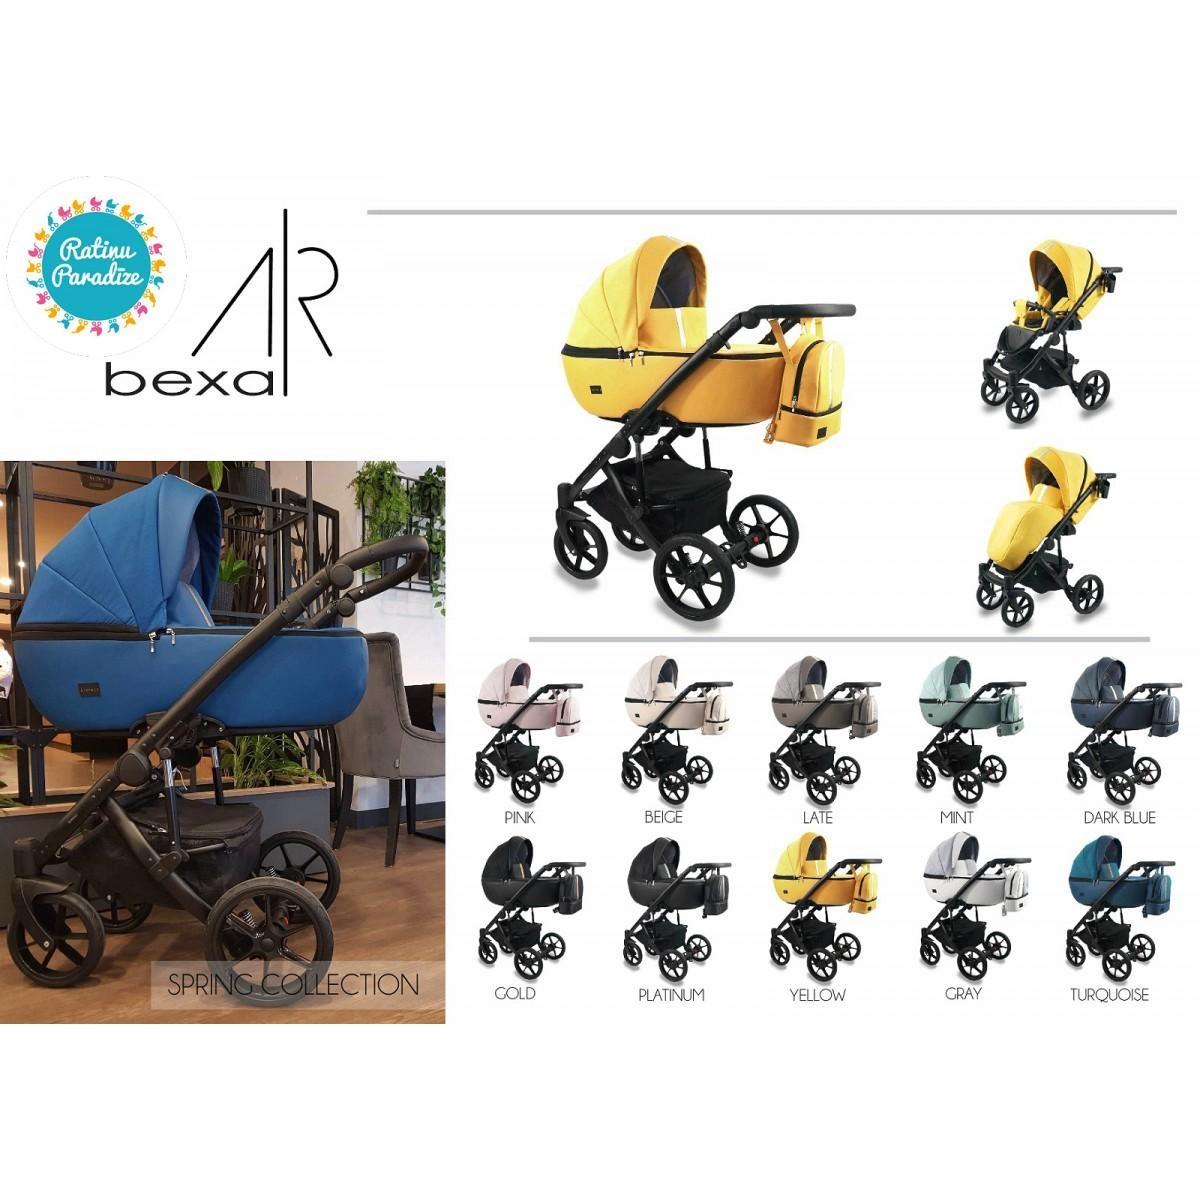 Bērnu- rati - Bexa- Air.Детская универсальная коляска-BEXA AIR